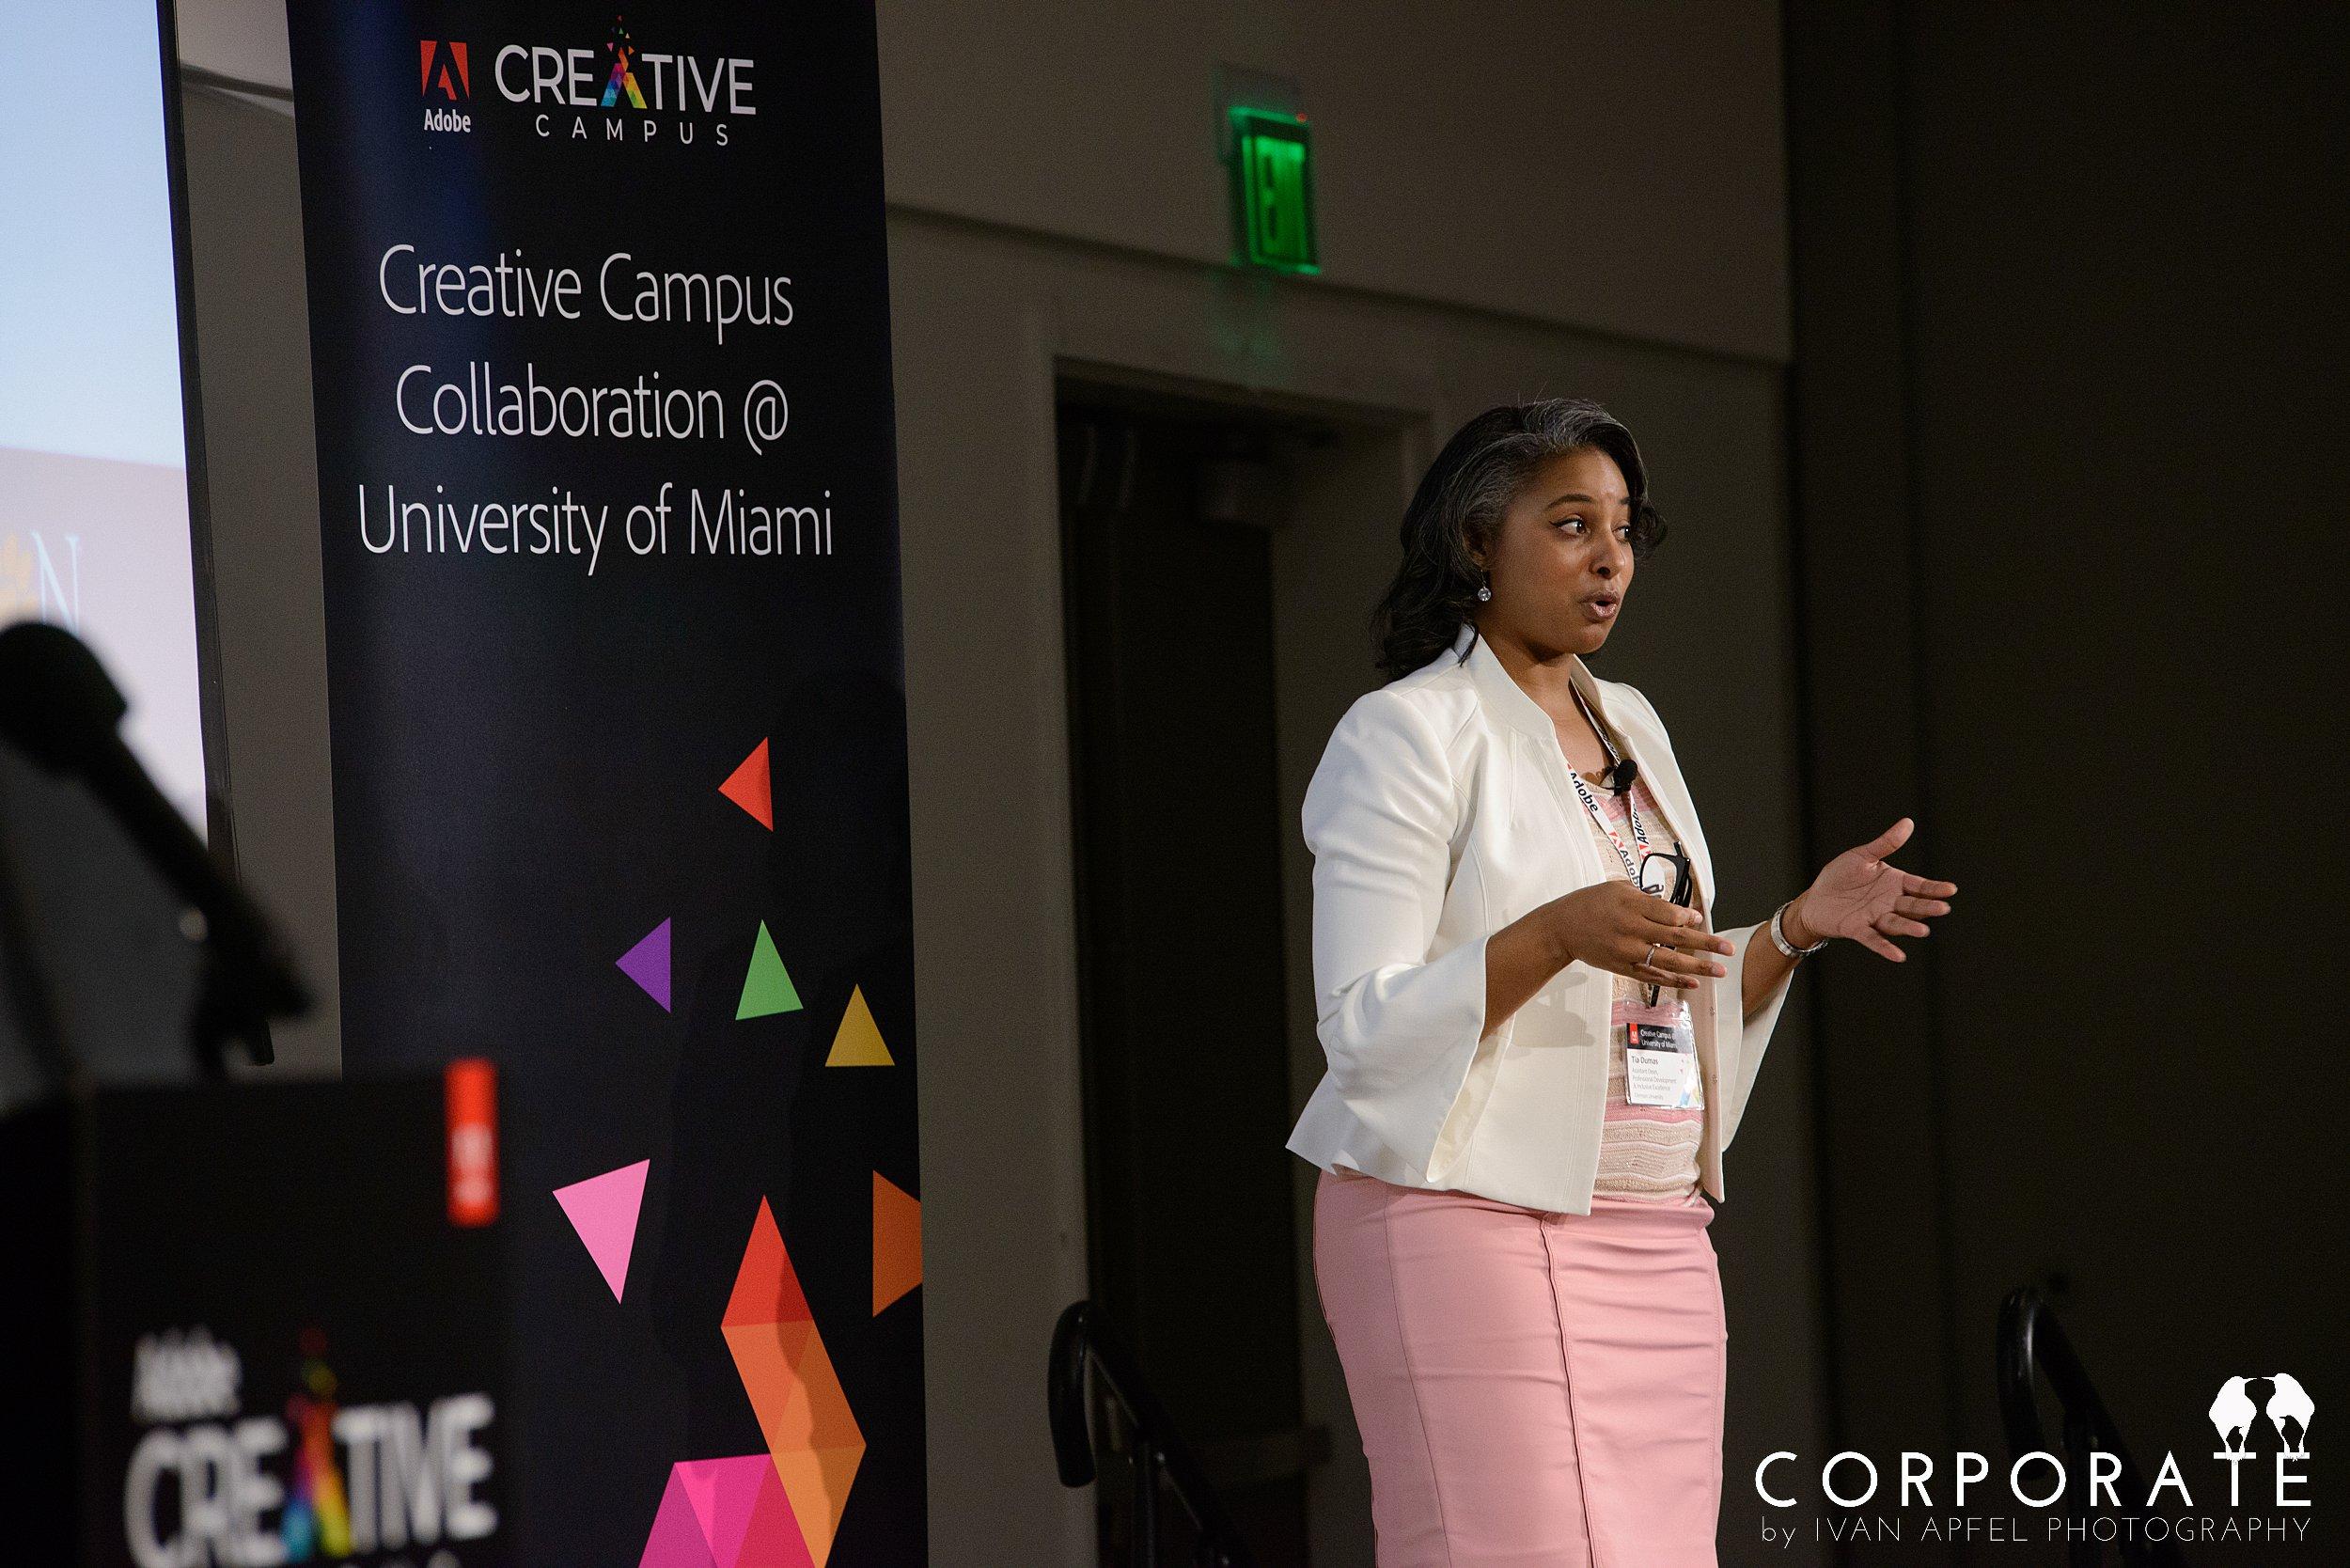 Miami Corporate Event Photographer Adobe Systems Creative Campus 2019-D2_Adobe_Creative_Campus_UMiami-_IAP9177.jpg